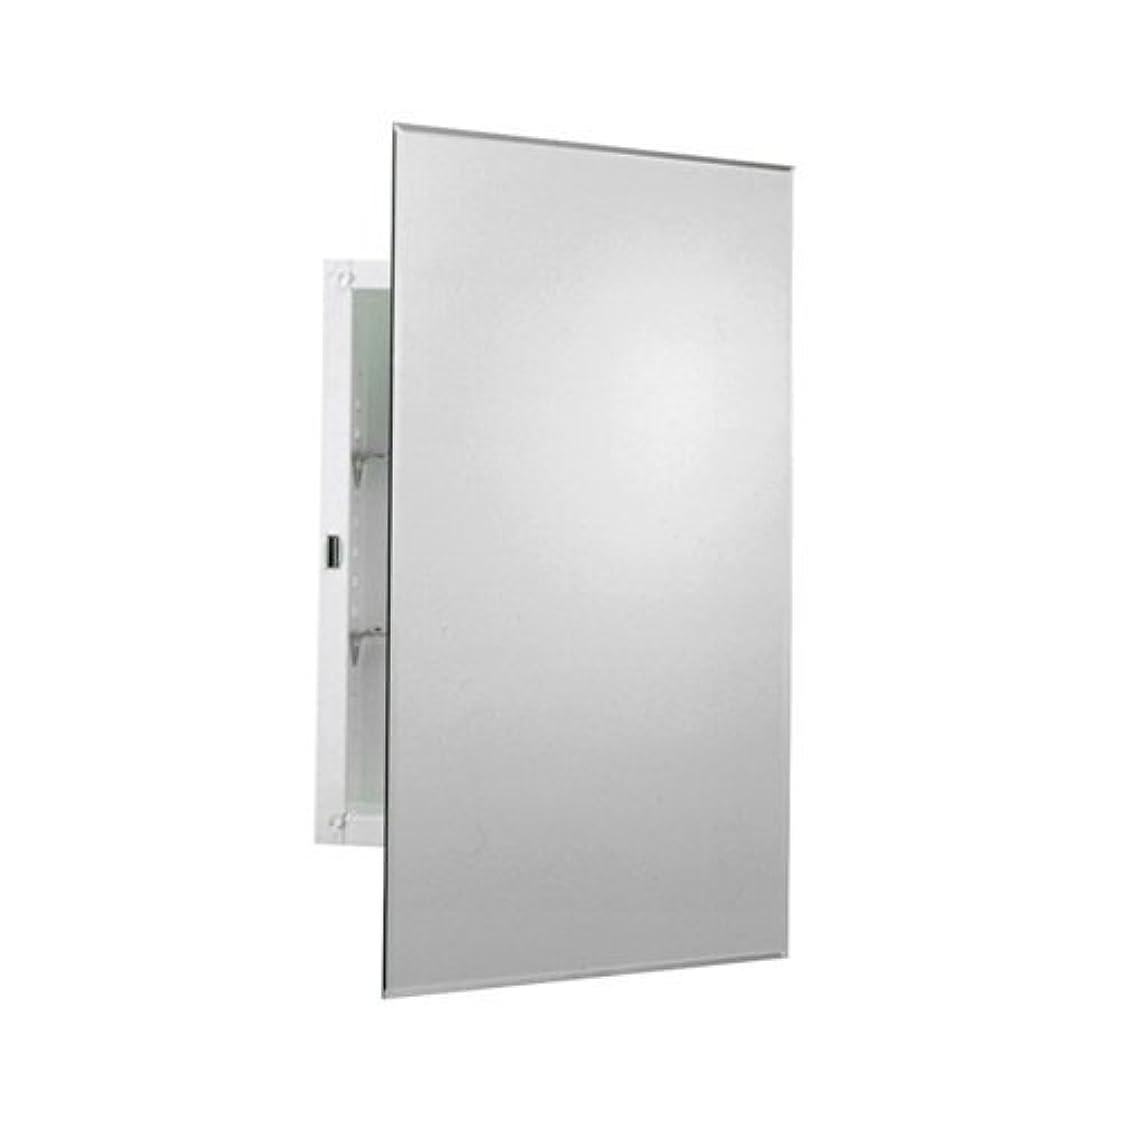 追記帽子入力Zenith EMM1027, Prism Beveled Medicine Cabinet, Frameless